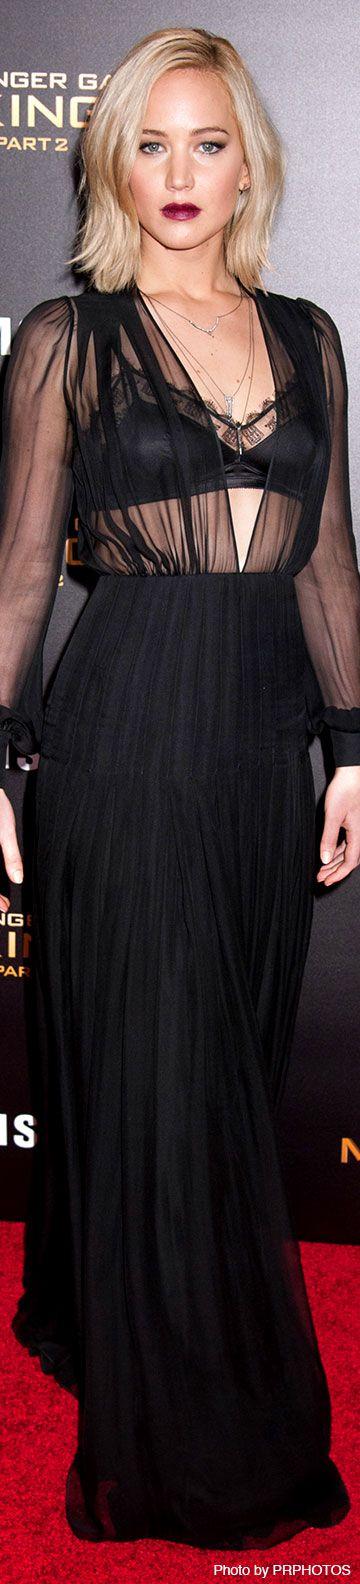 "Jennifer Lawrence wearing black Schiaparelli dress and Eva Fehren jewelry - ""The Hunger Games: Mockingjay - Part 2"" New York City Premiere - 11/18/2015"